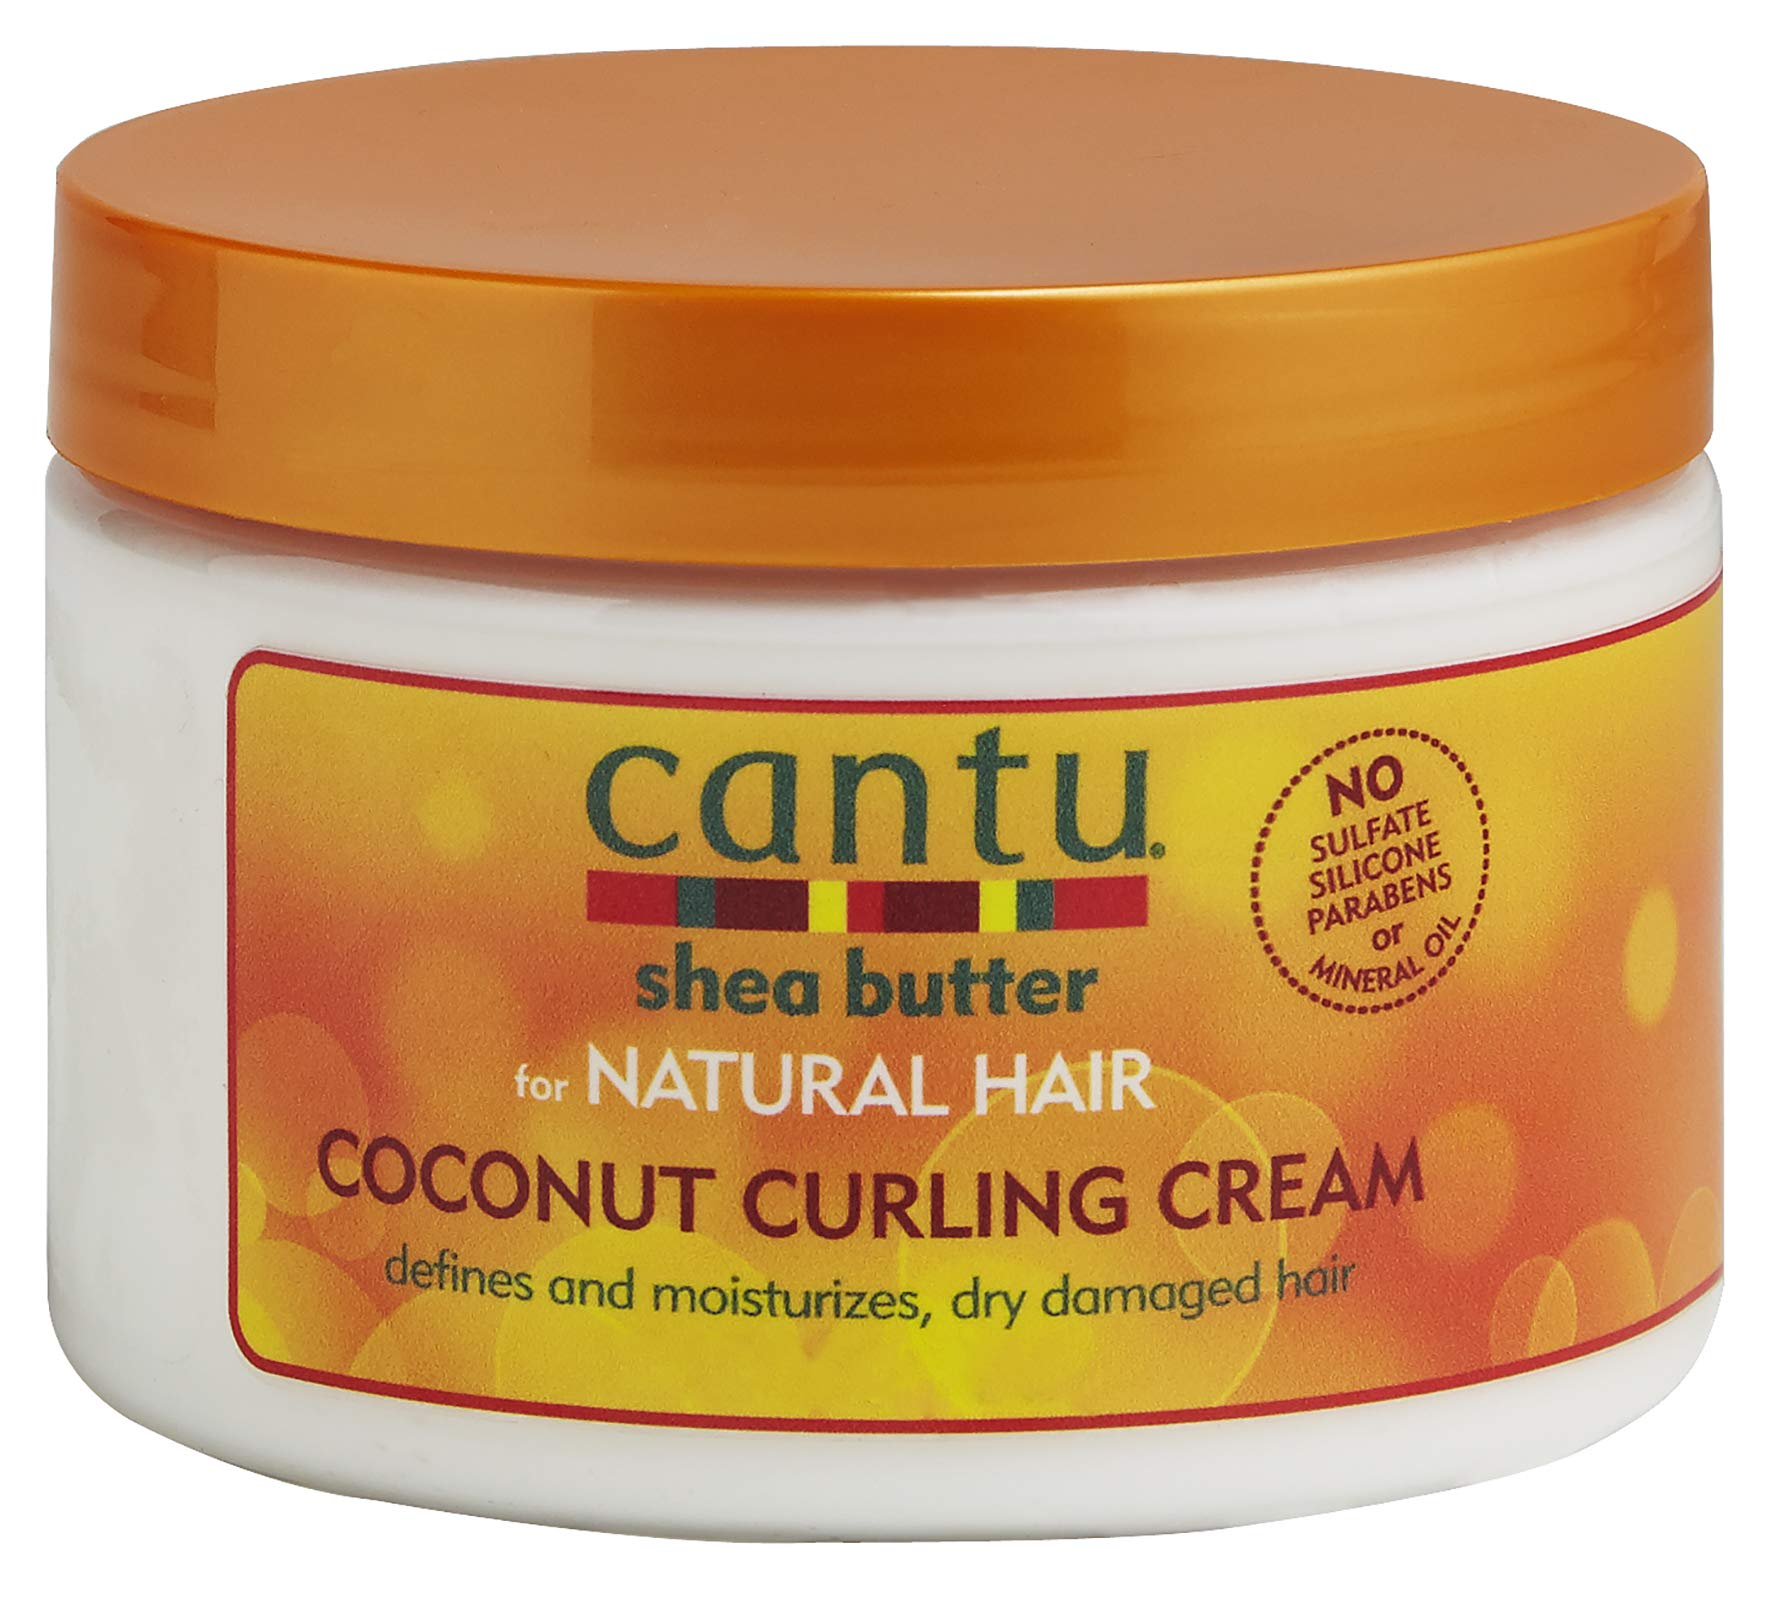 Cantu Coconut Curling Cream Ounce